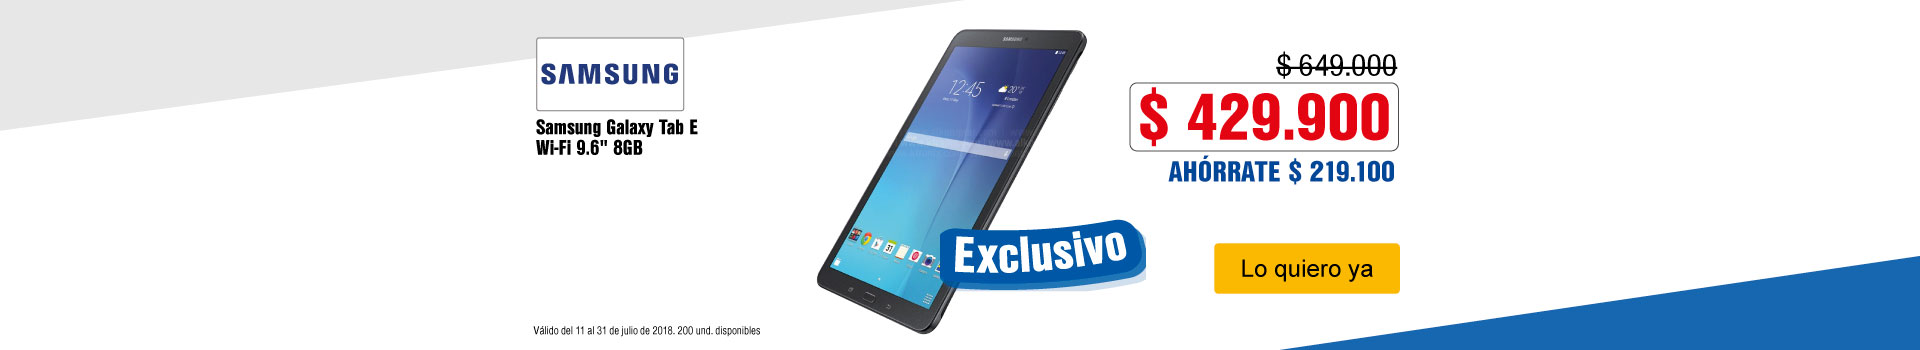 AK-KT-BCAT-2-computadores y tablets-PP---Samsung-Galaxy Tab E 9.6